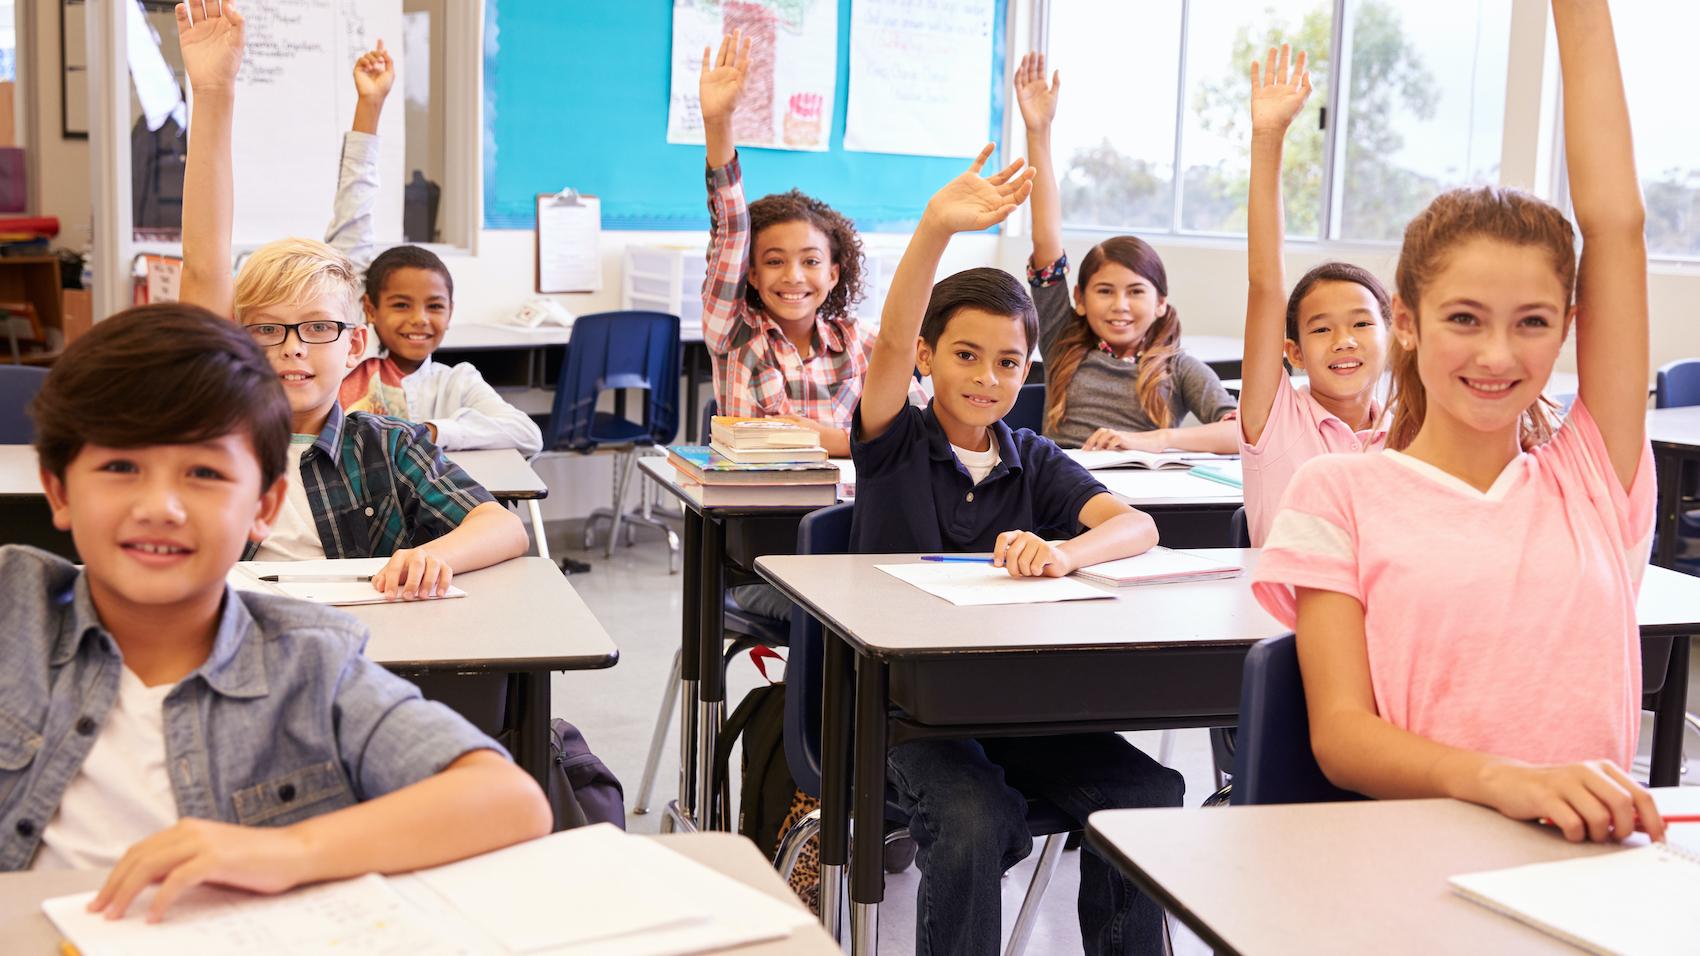 Elementary school kids in a classroom raising their hands.